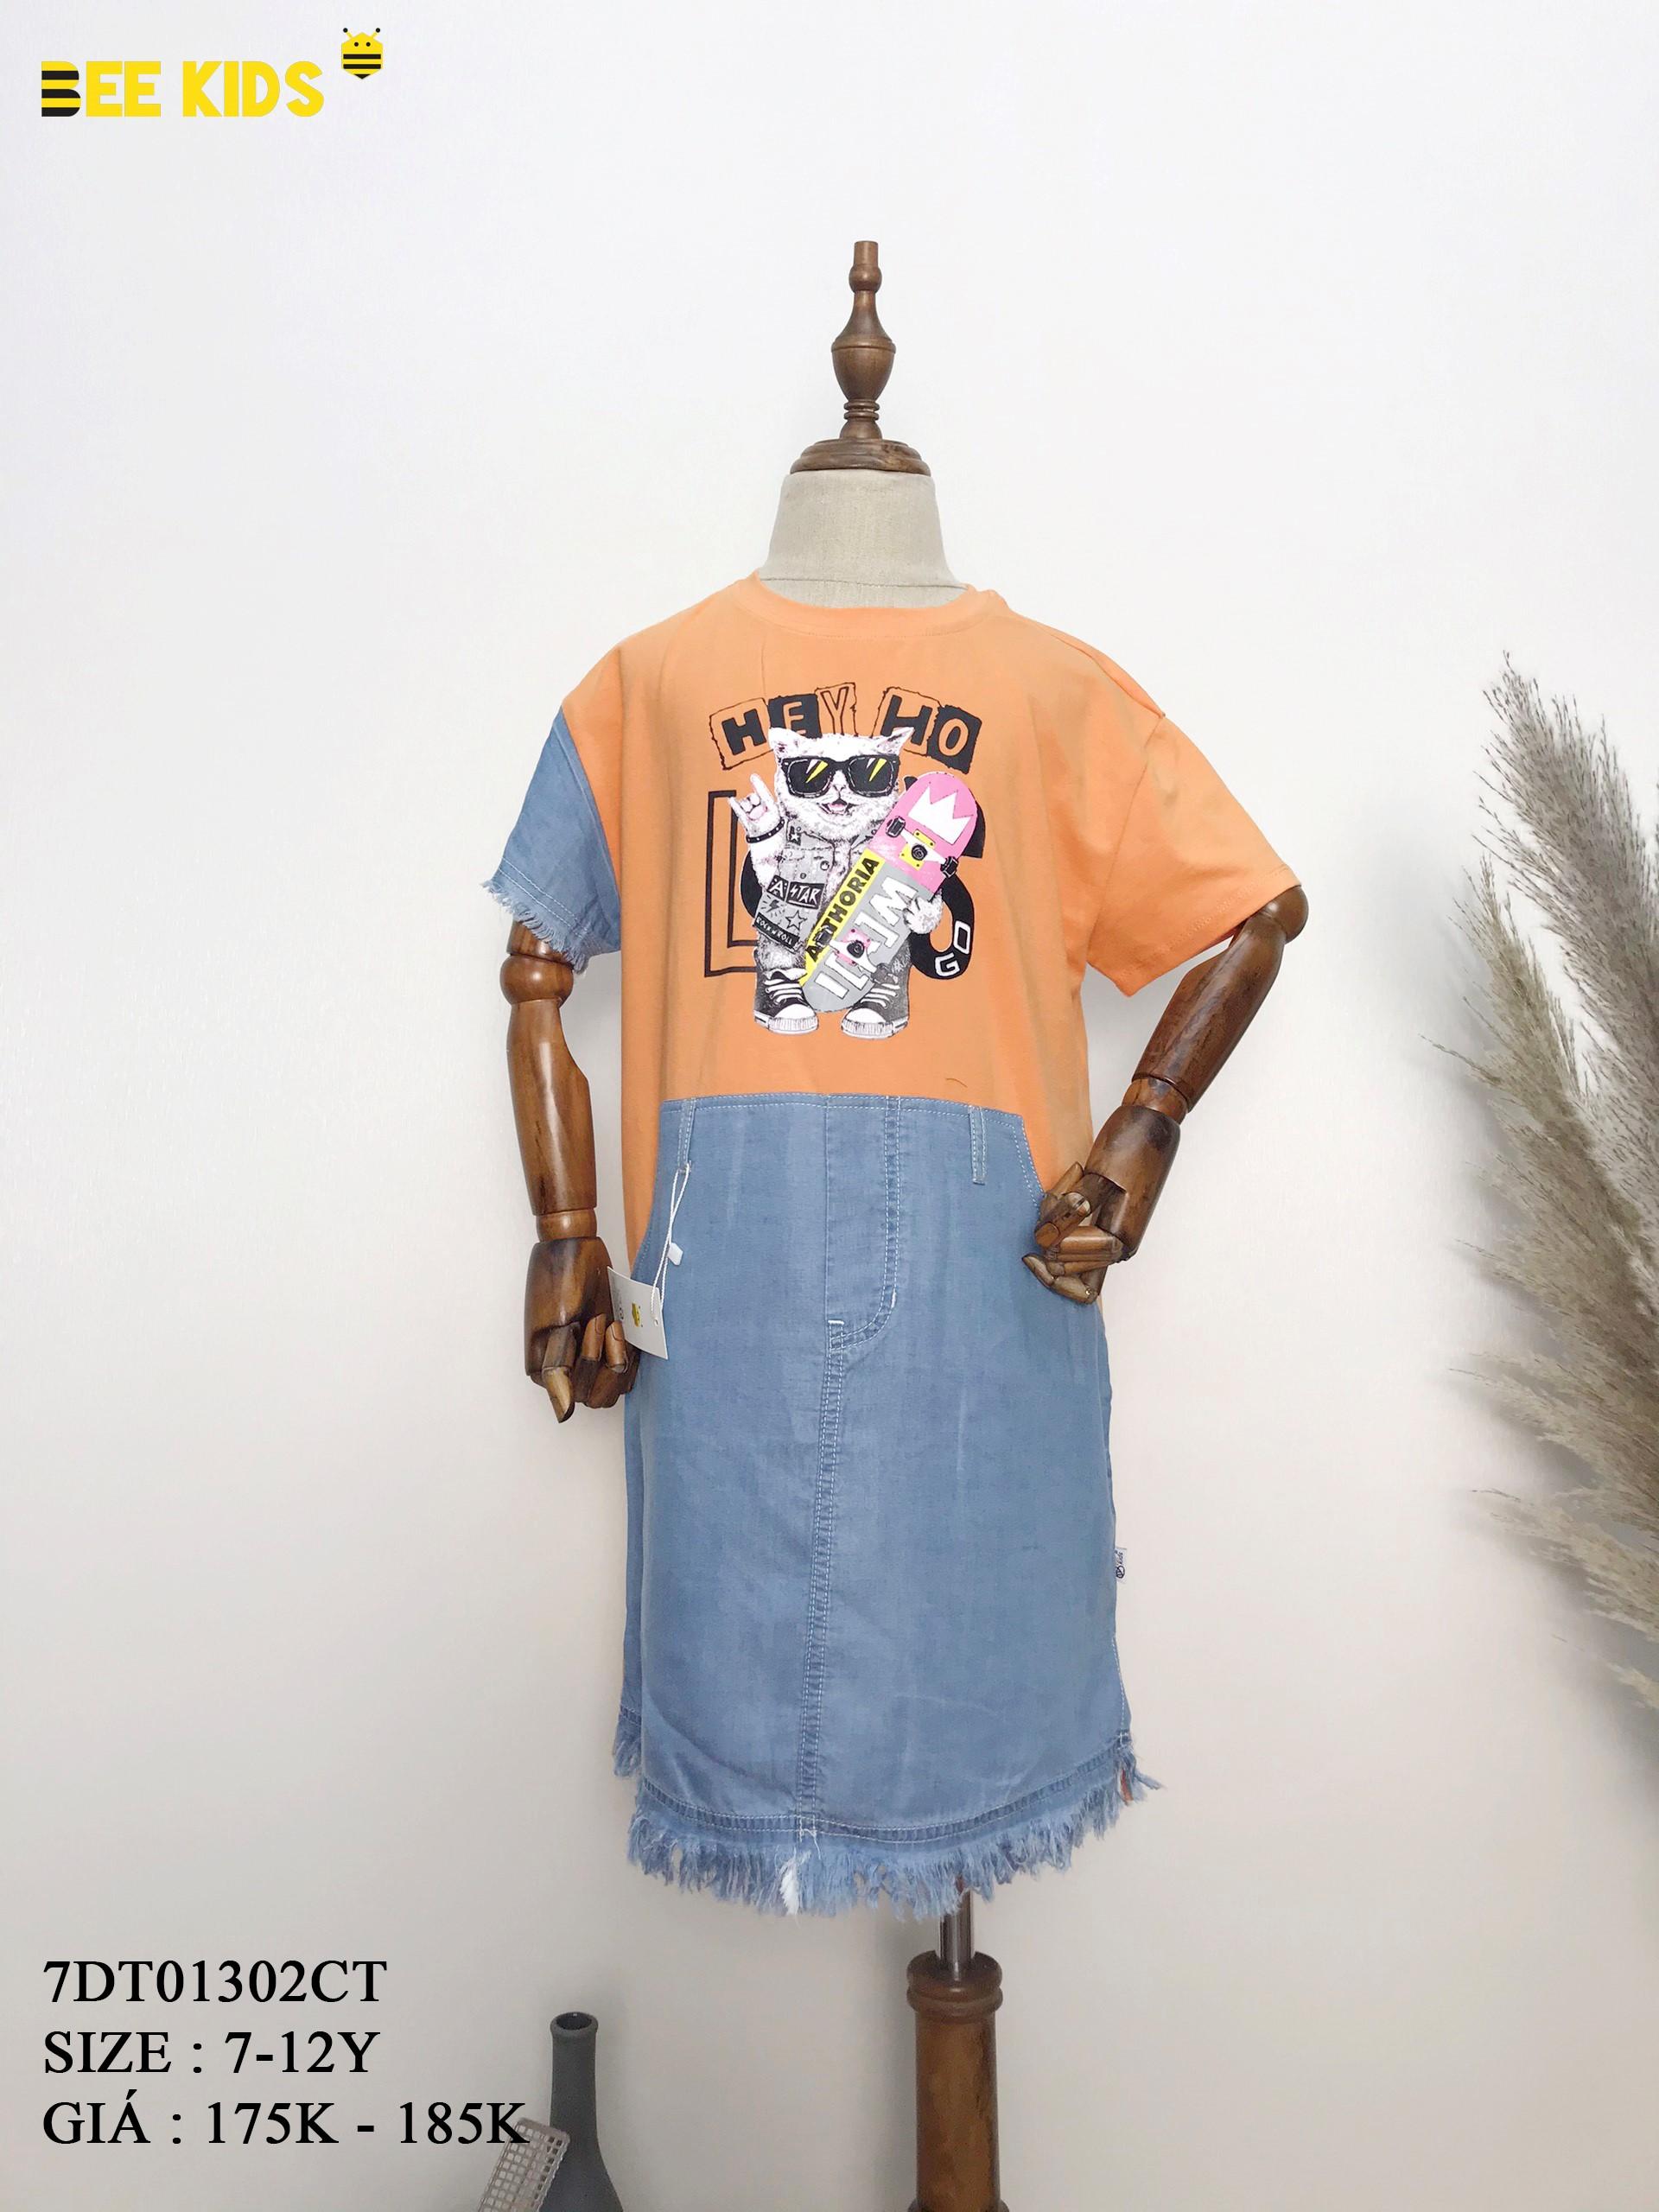 Váy thun phối jean cho bé 7-12 tuổi